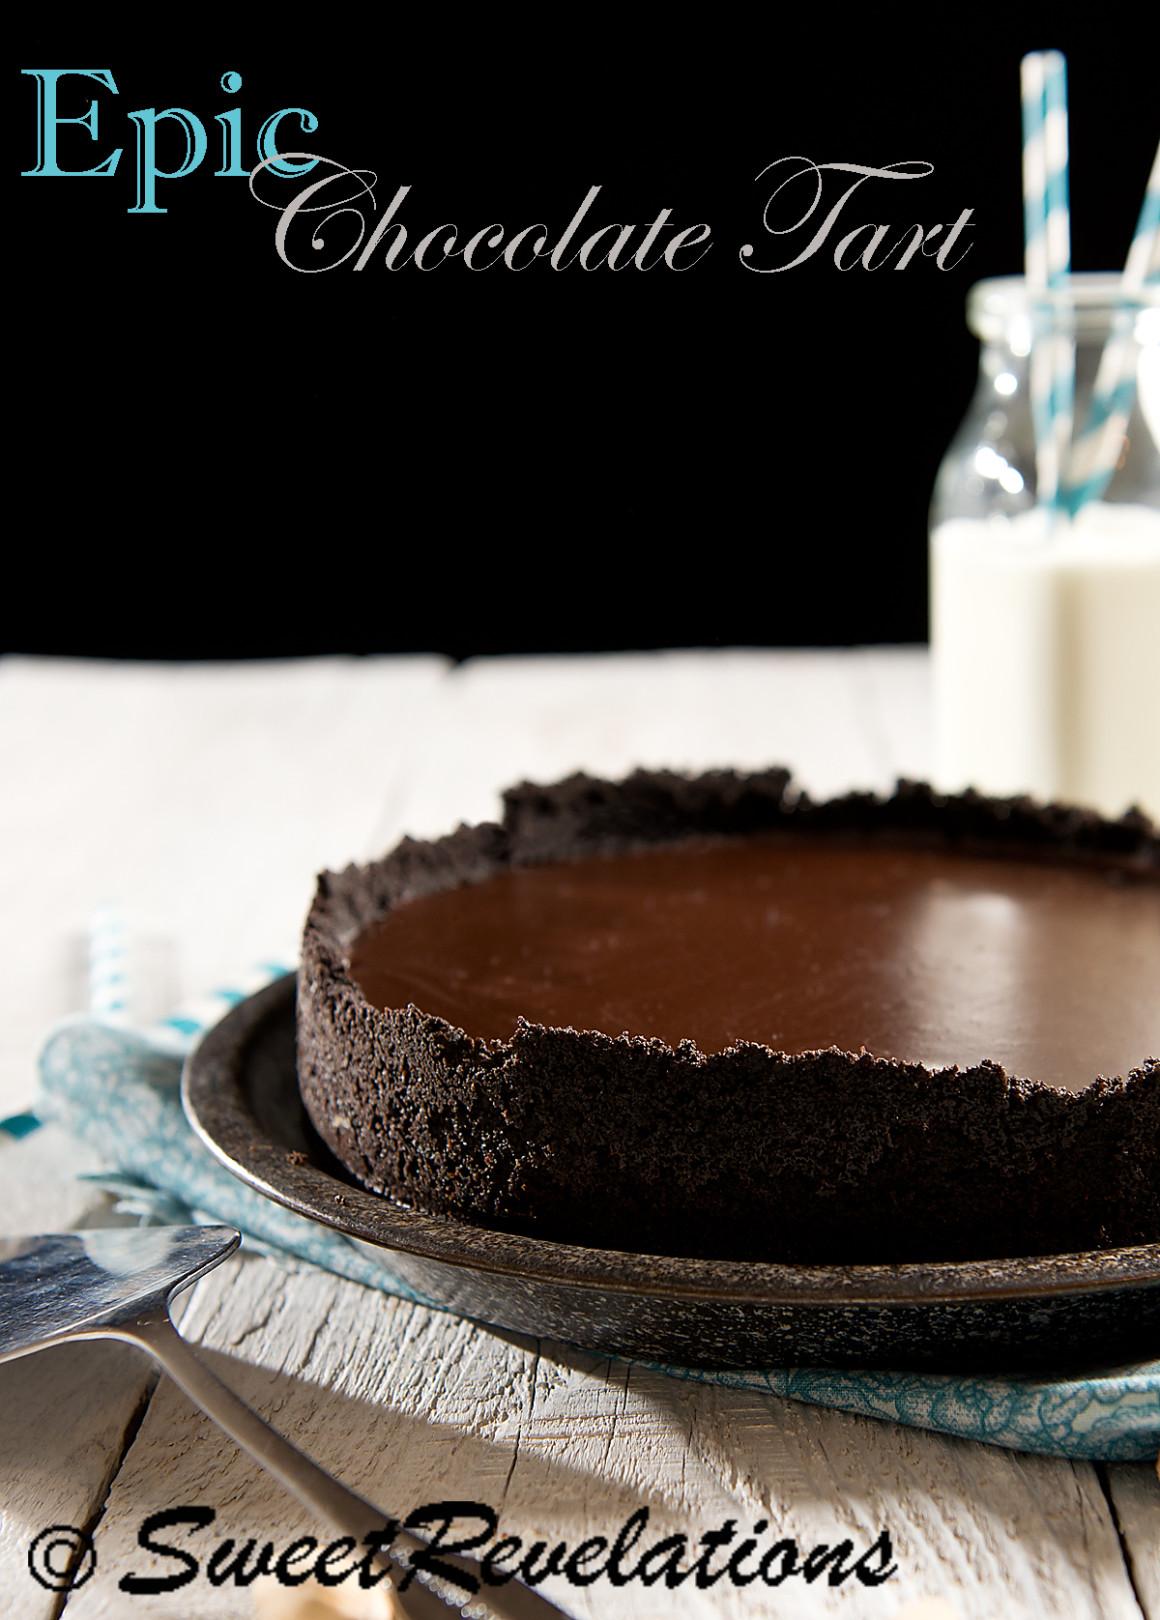 Epic Chocolate Tart Recipe from Sweet Revelations